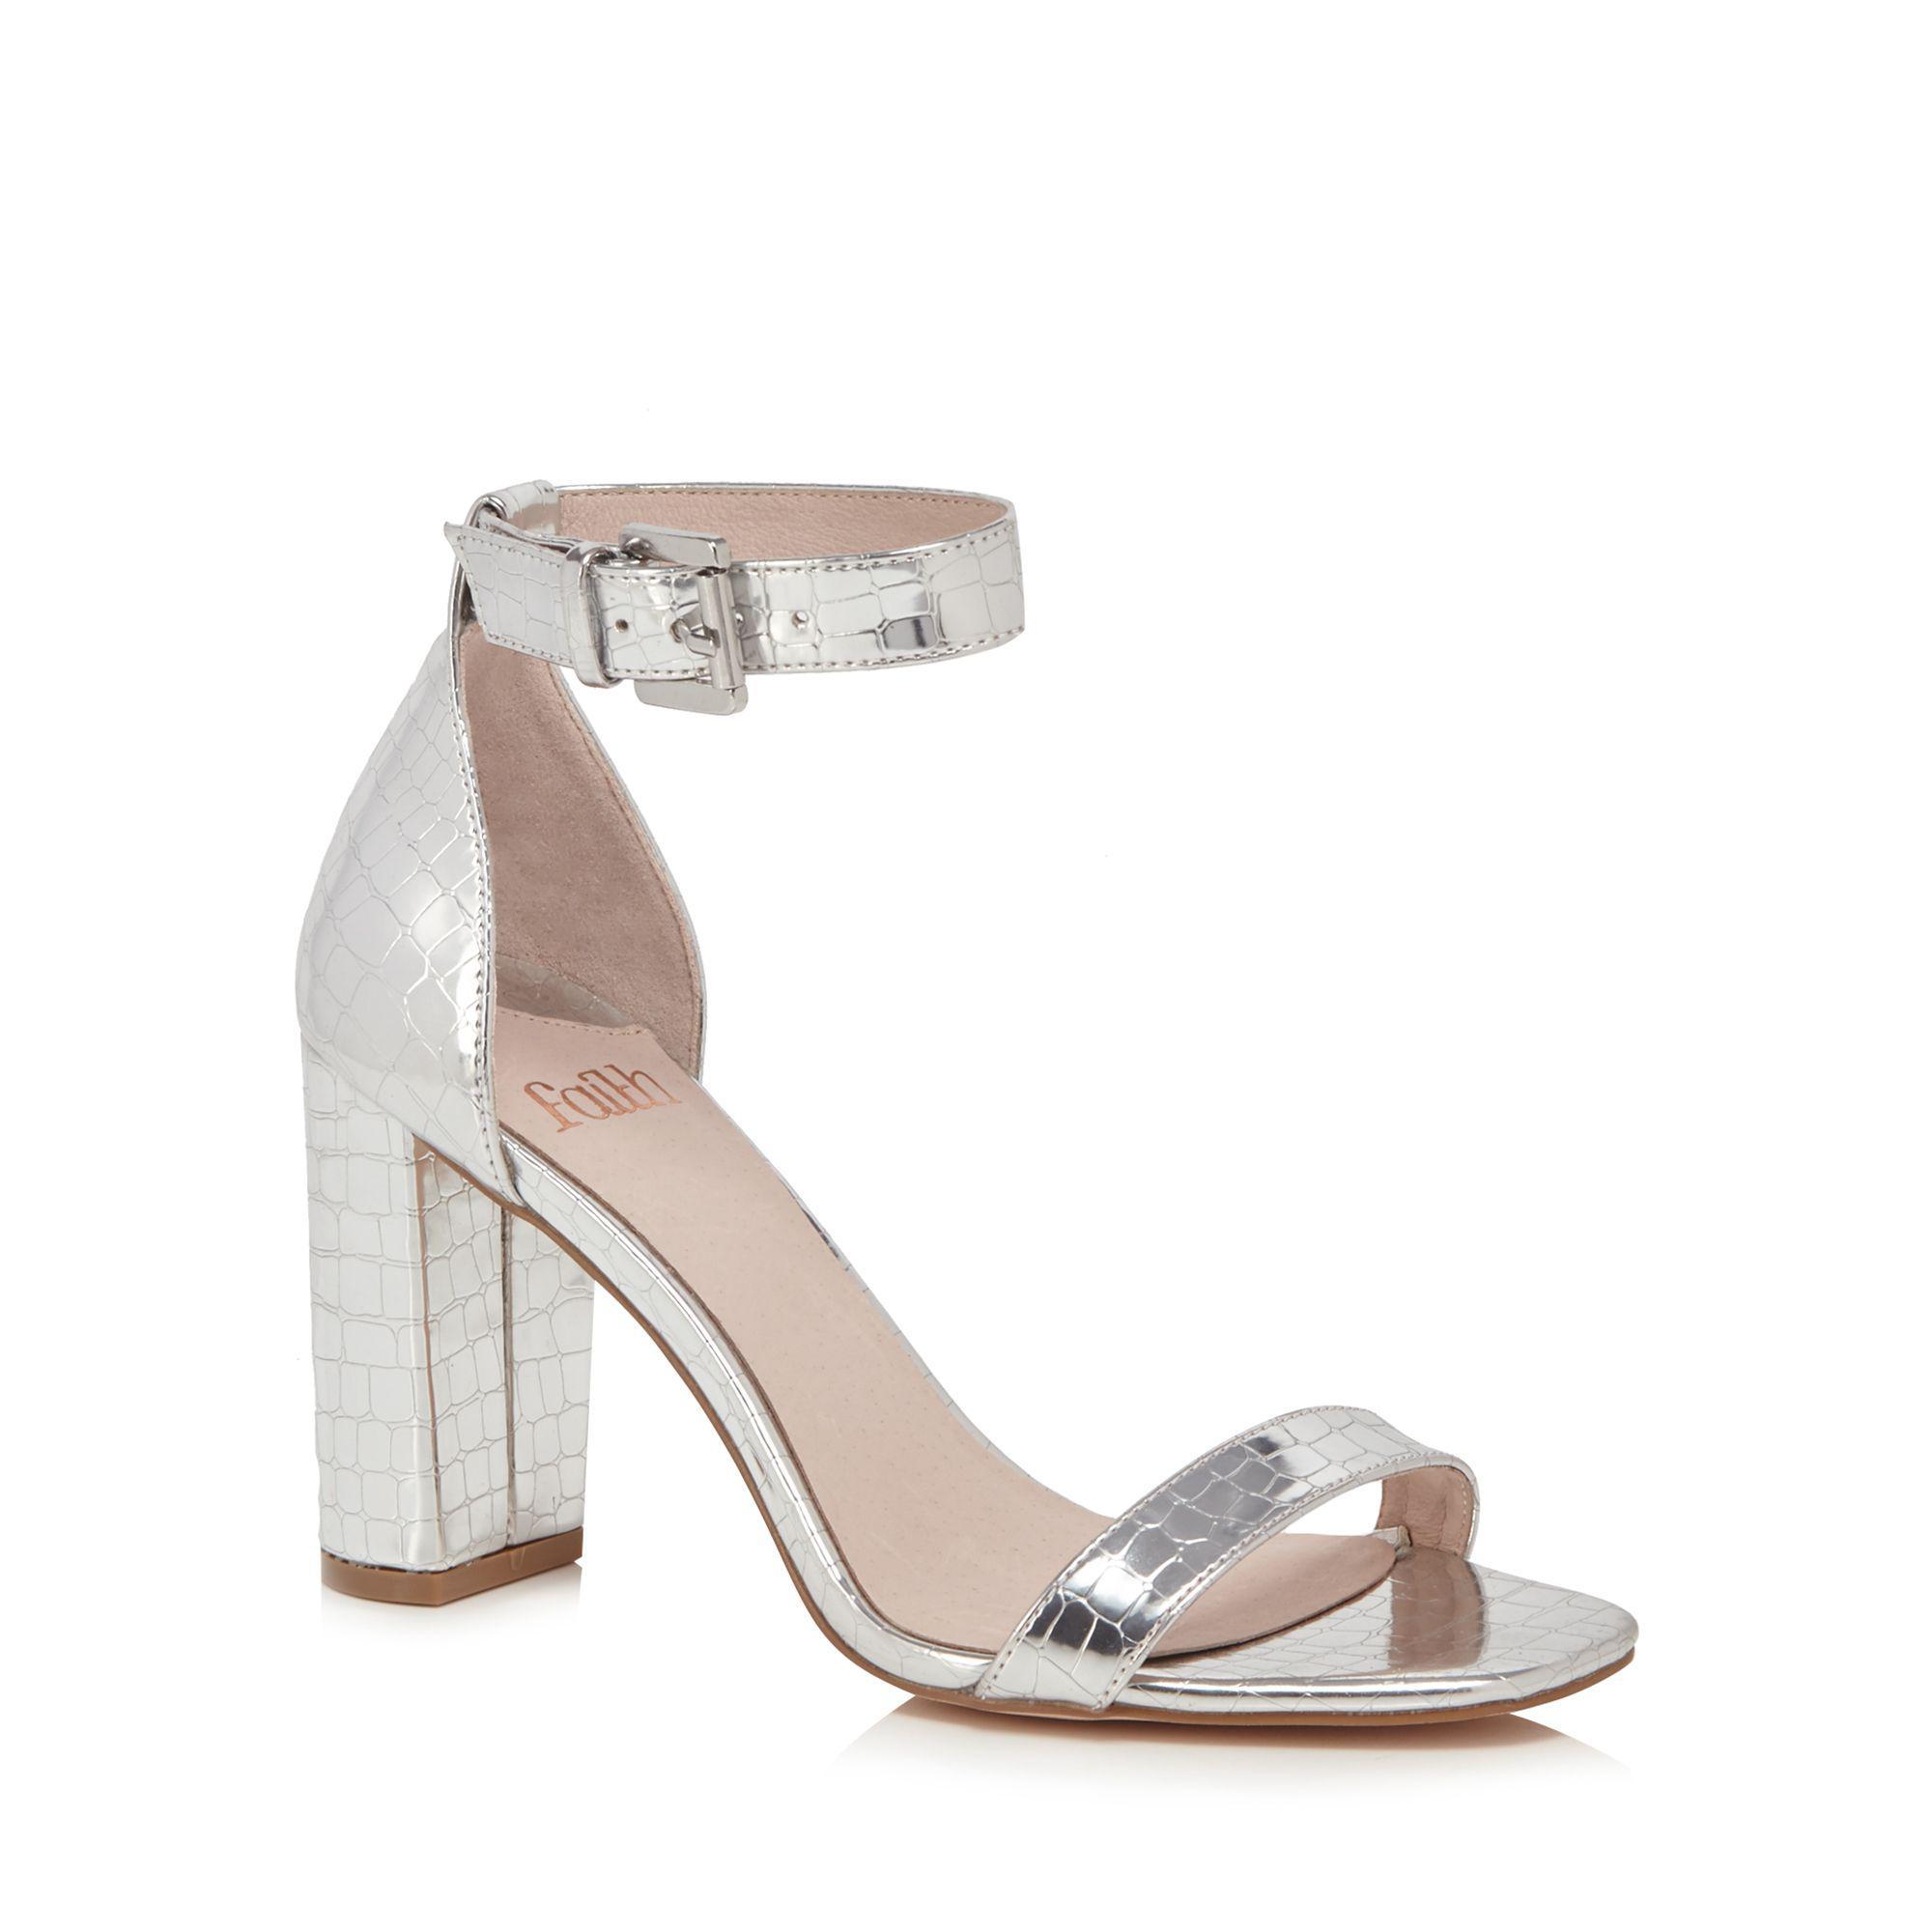 20c1bb11d2fb Faith Silver  dorita  High Block Heel Ankle Strap Sandals in ...